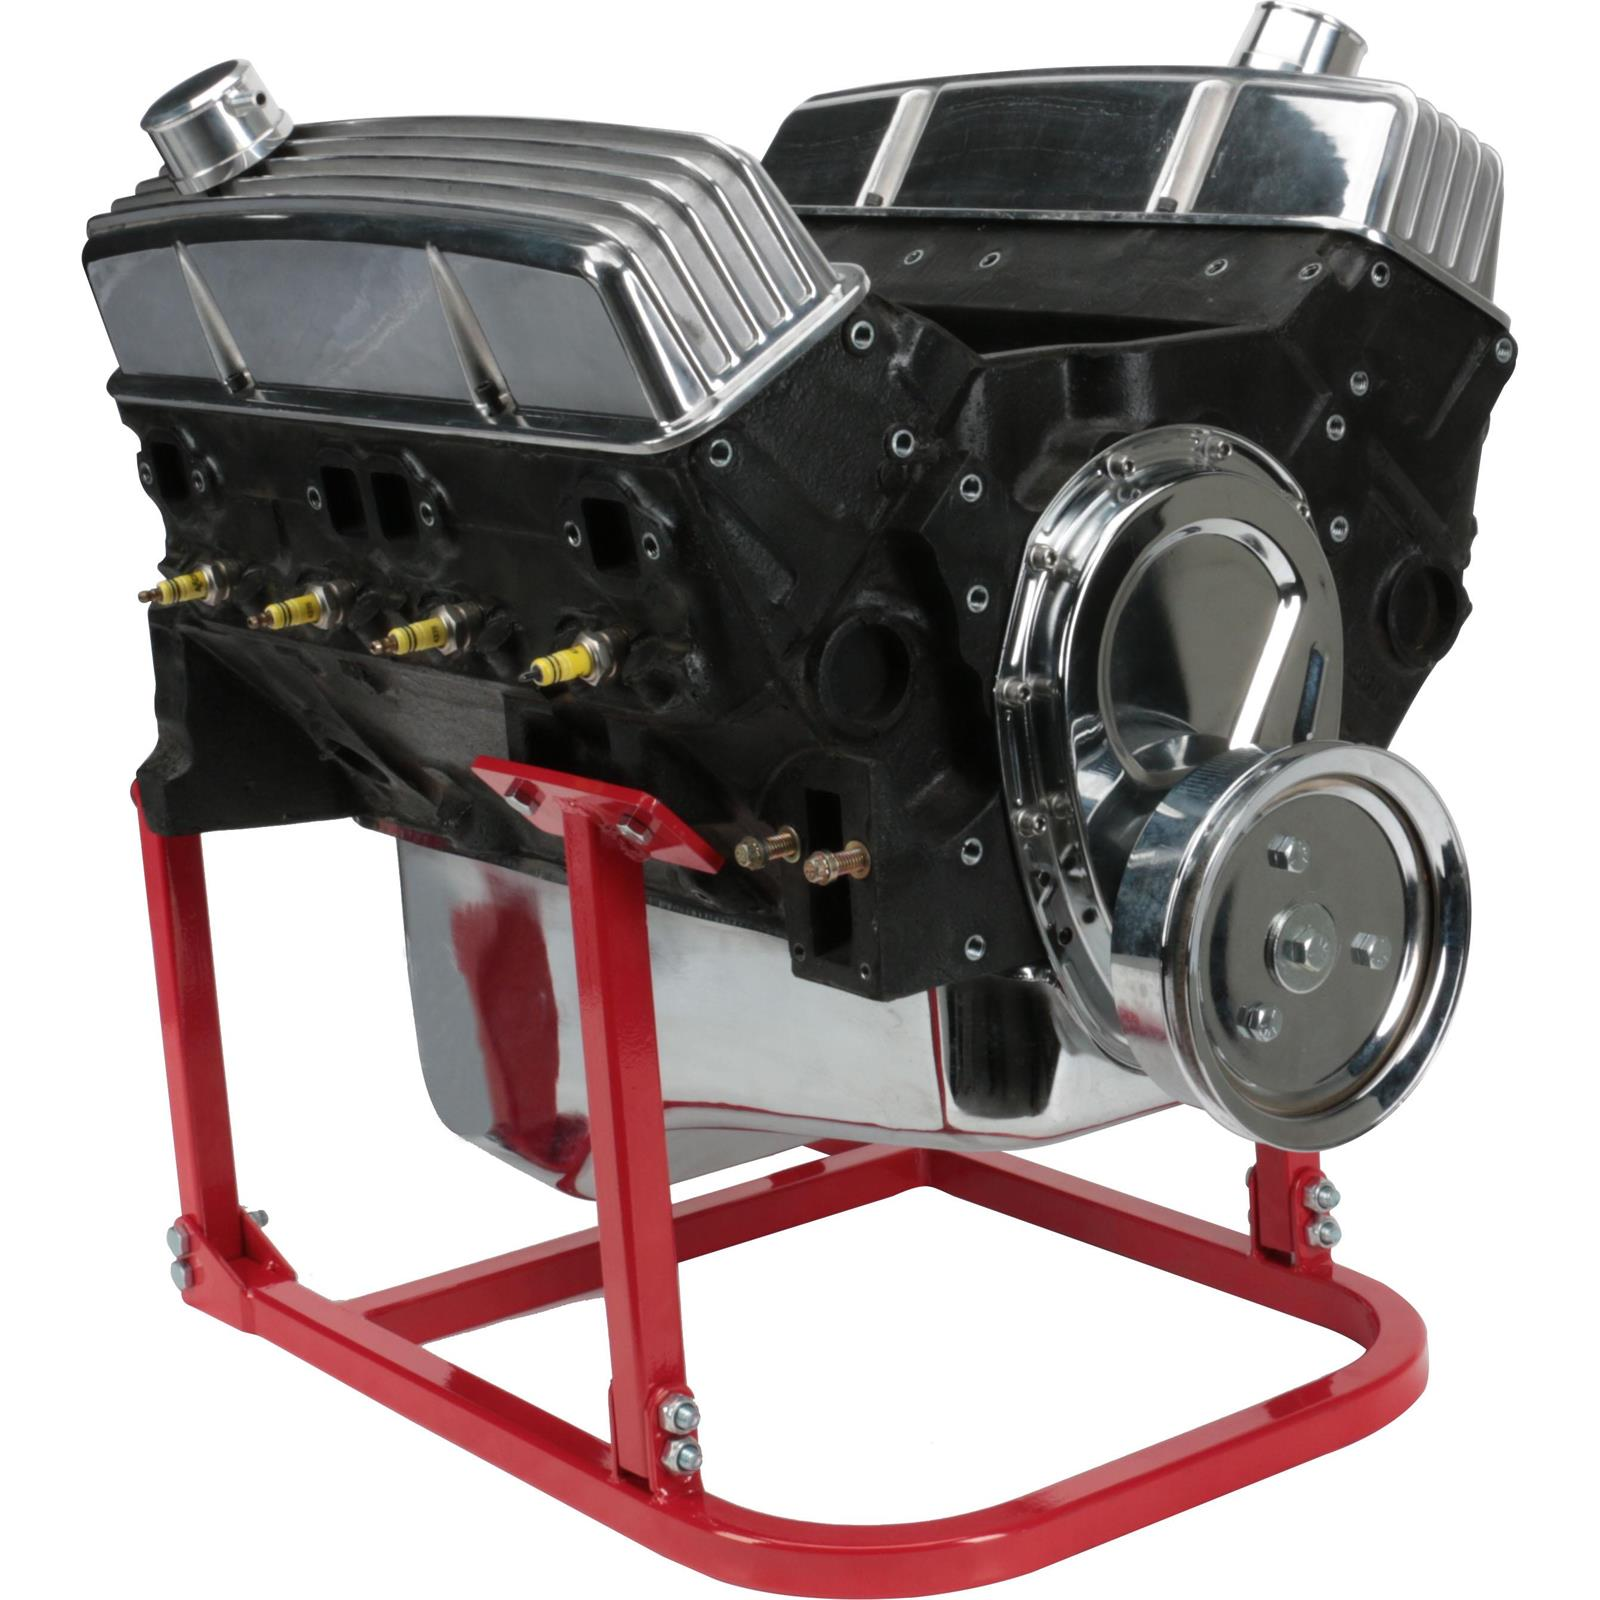 Speedway SBC Small Block Chevy Engine Storage Stand